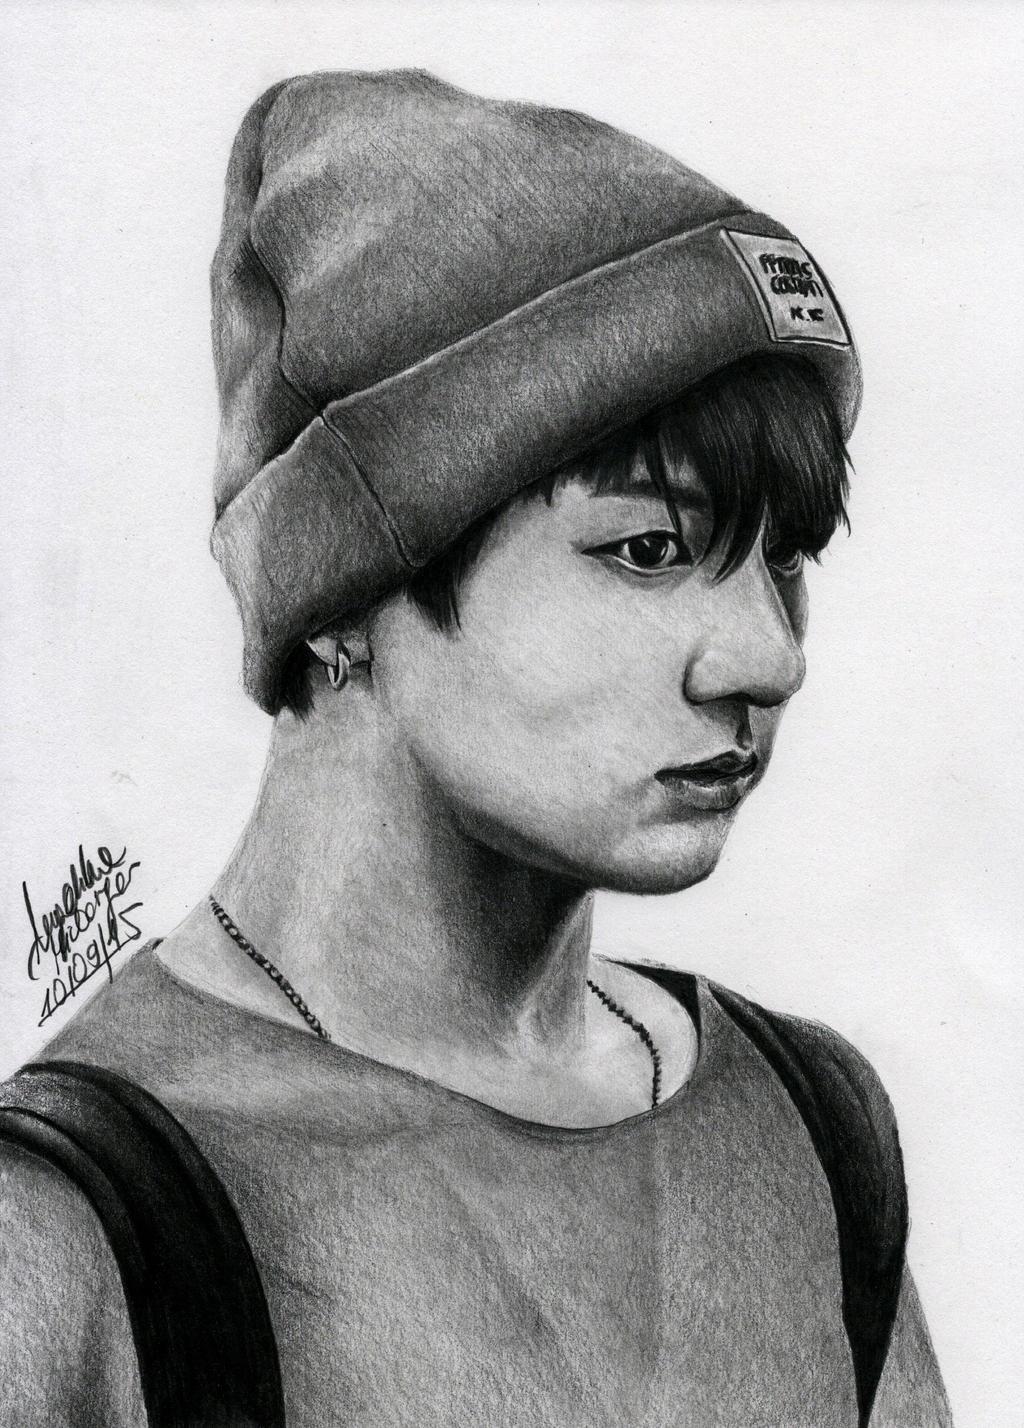 Jungkook Bts Drawings: BTS Jungkook By Angiebelikejolie On DeviantArt